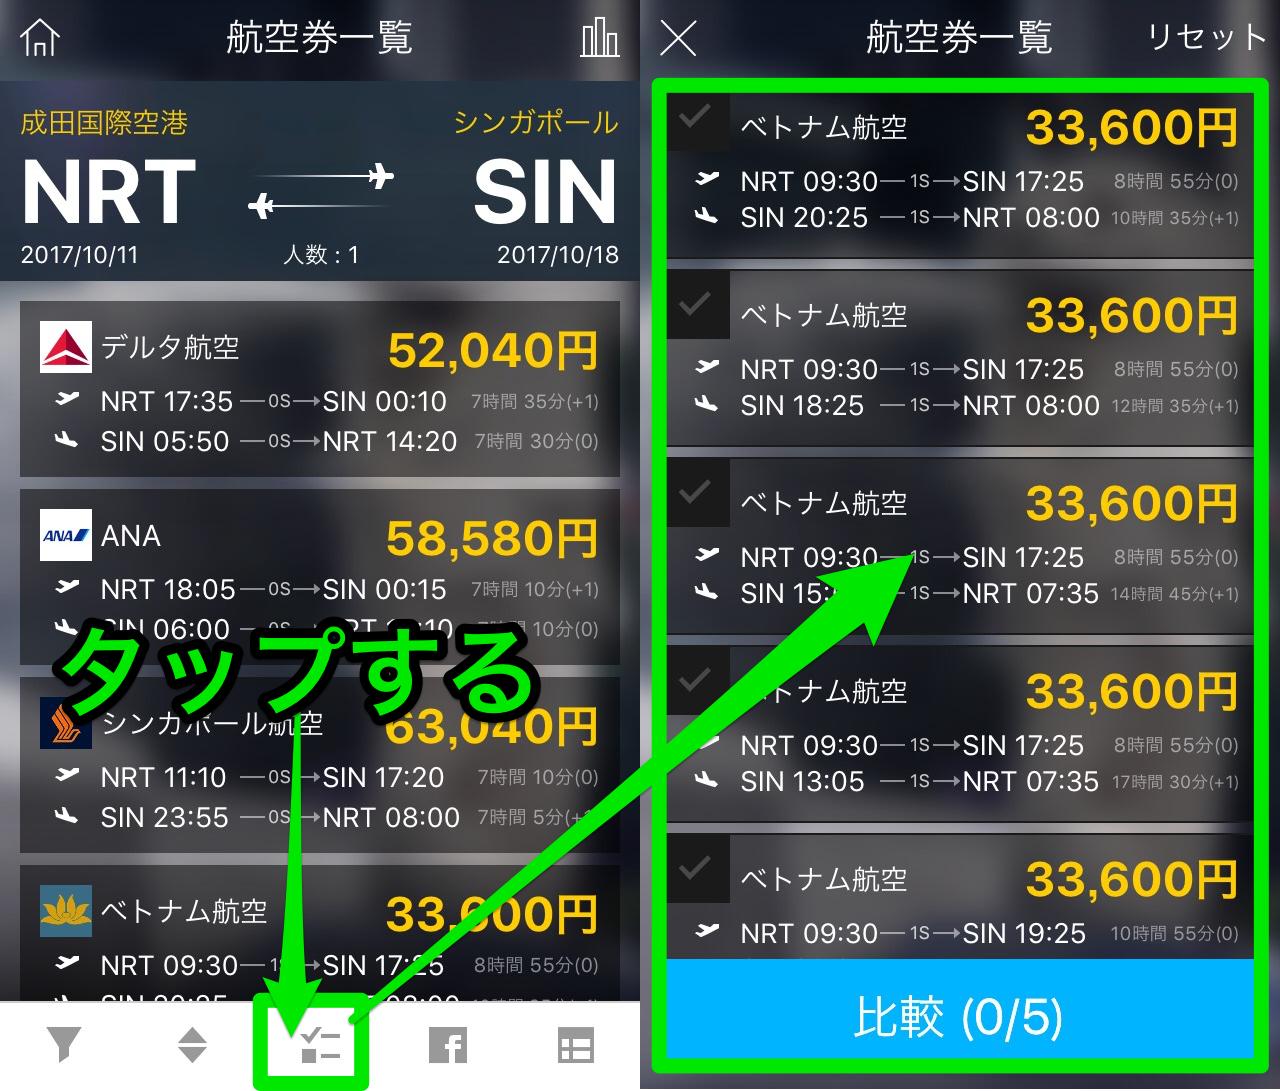 HISアプリ「航空券・ホテル」の航空券検索で比較